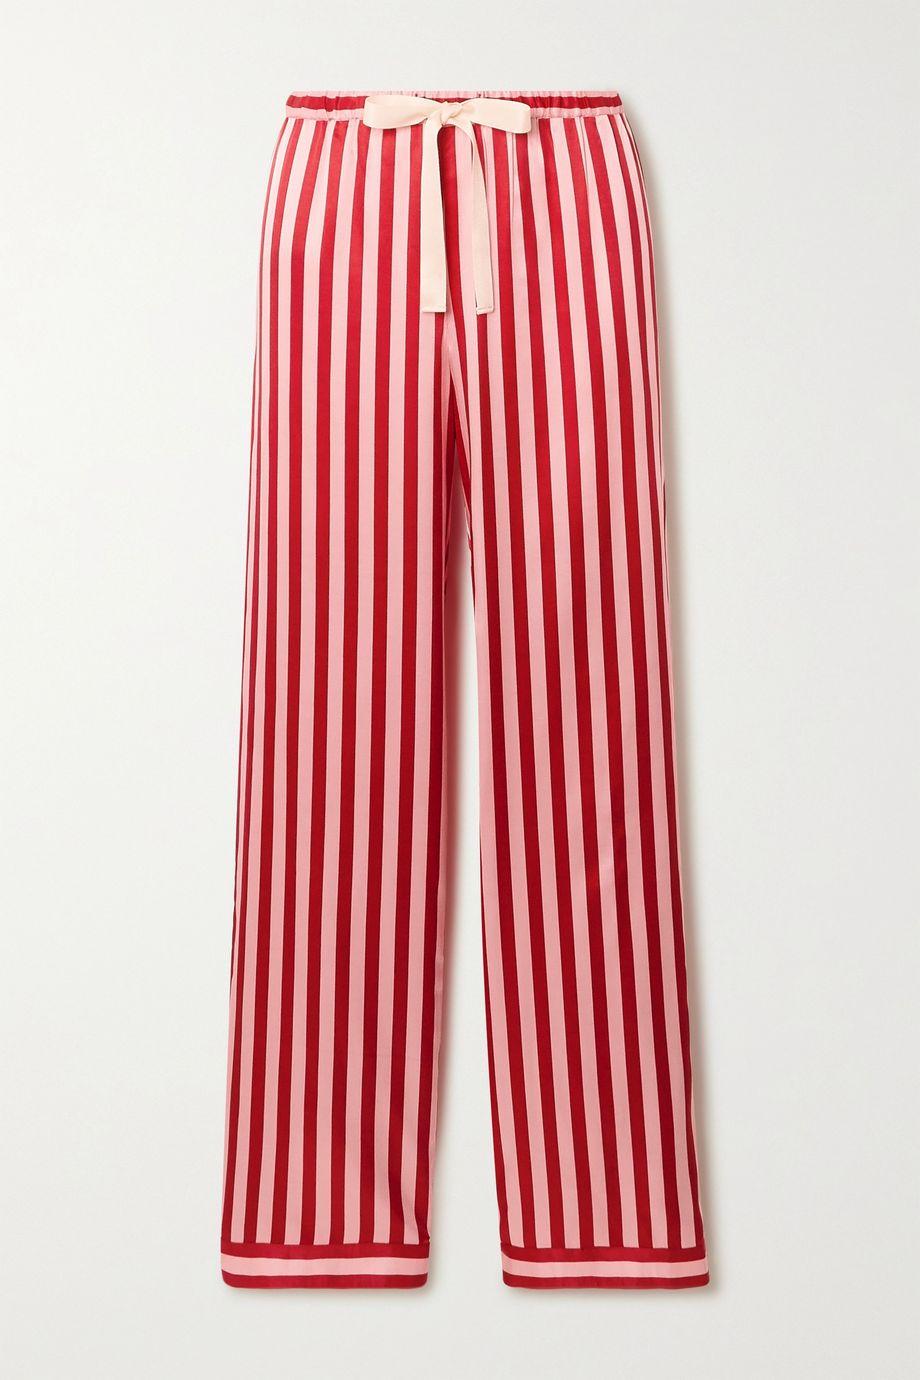 Morgan Lane Chantal striped satin pajama pants